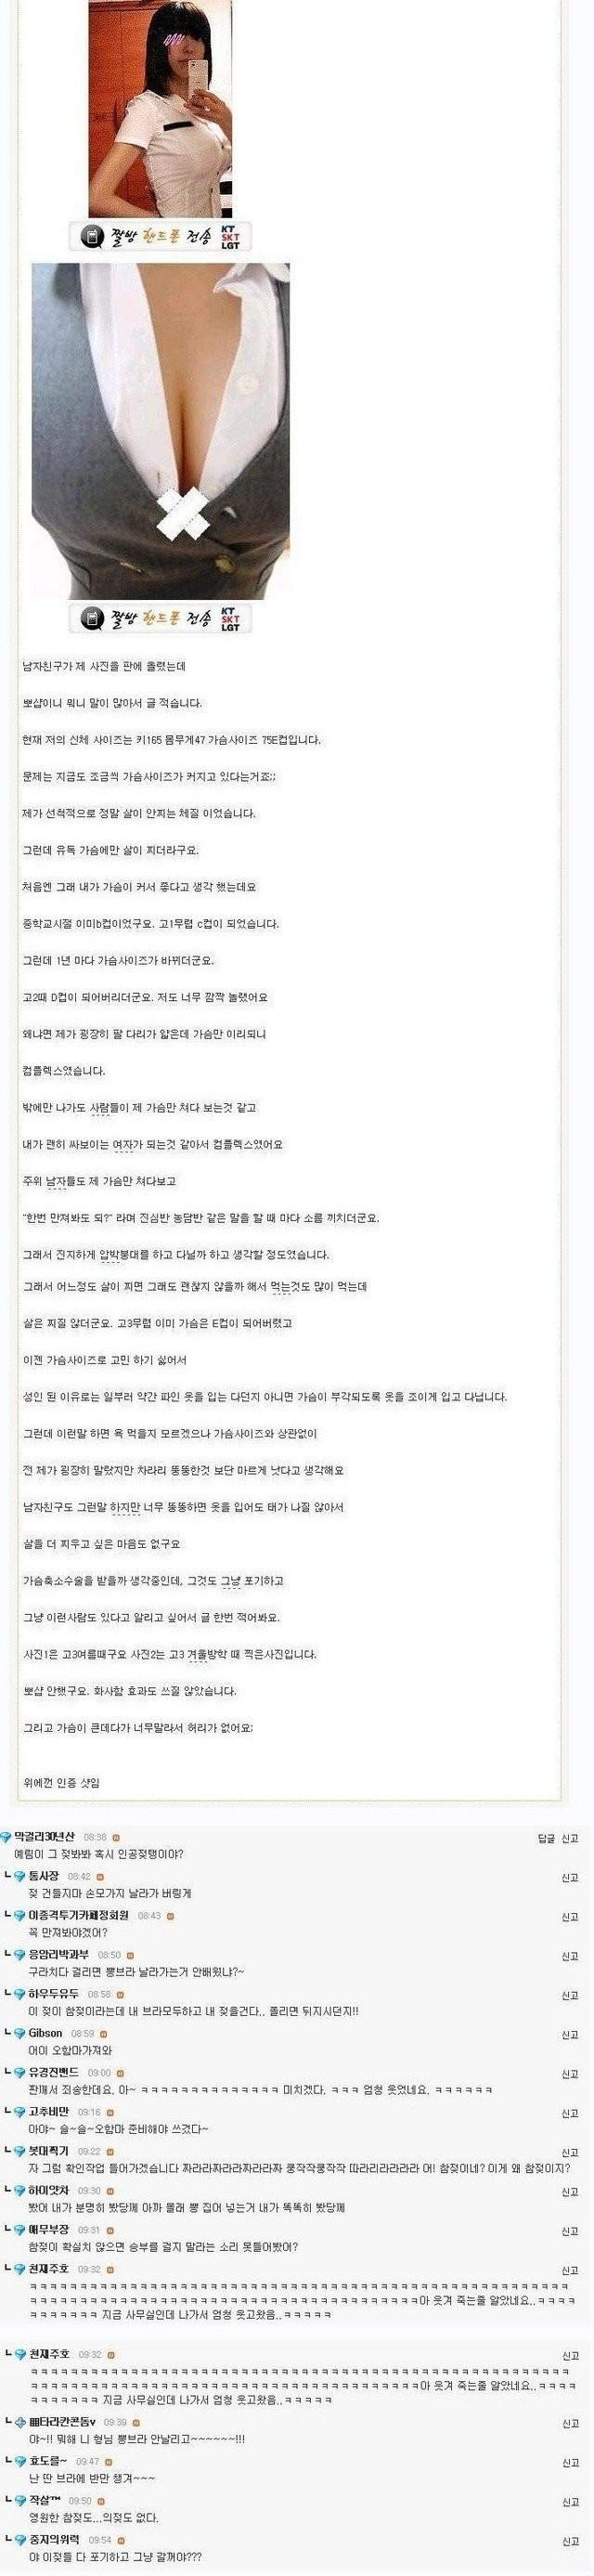 5.jpg 커뮤니티별 타짜 패러디 댓글.jpg